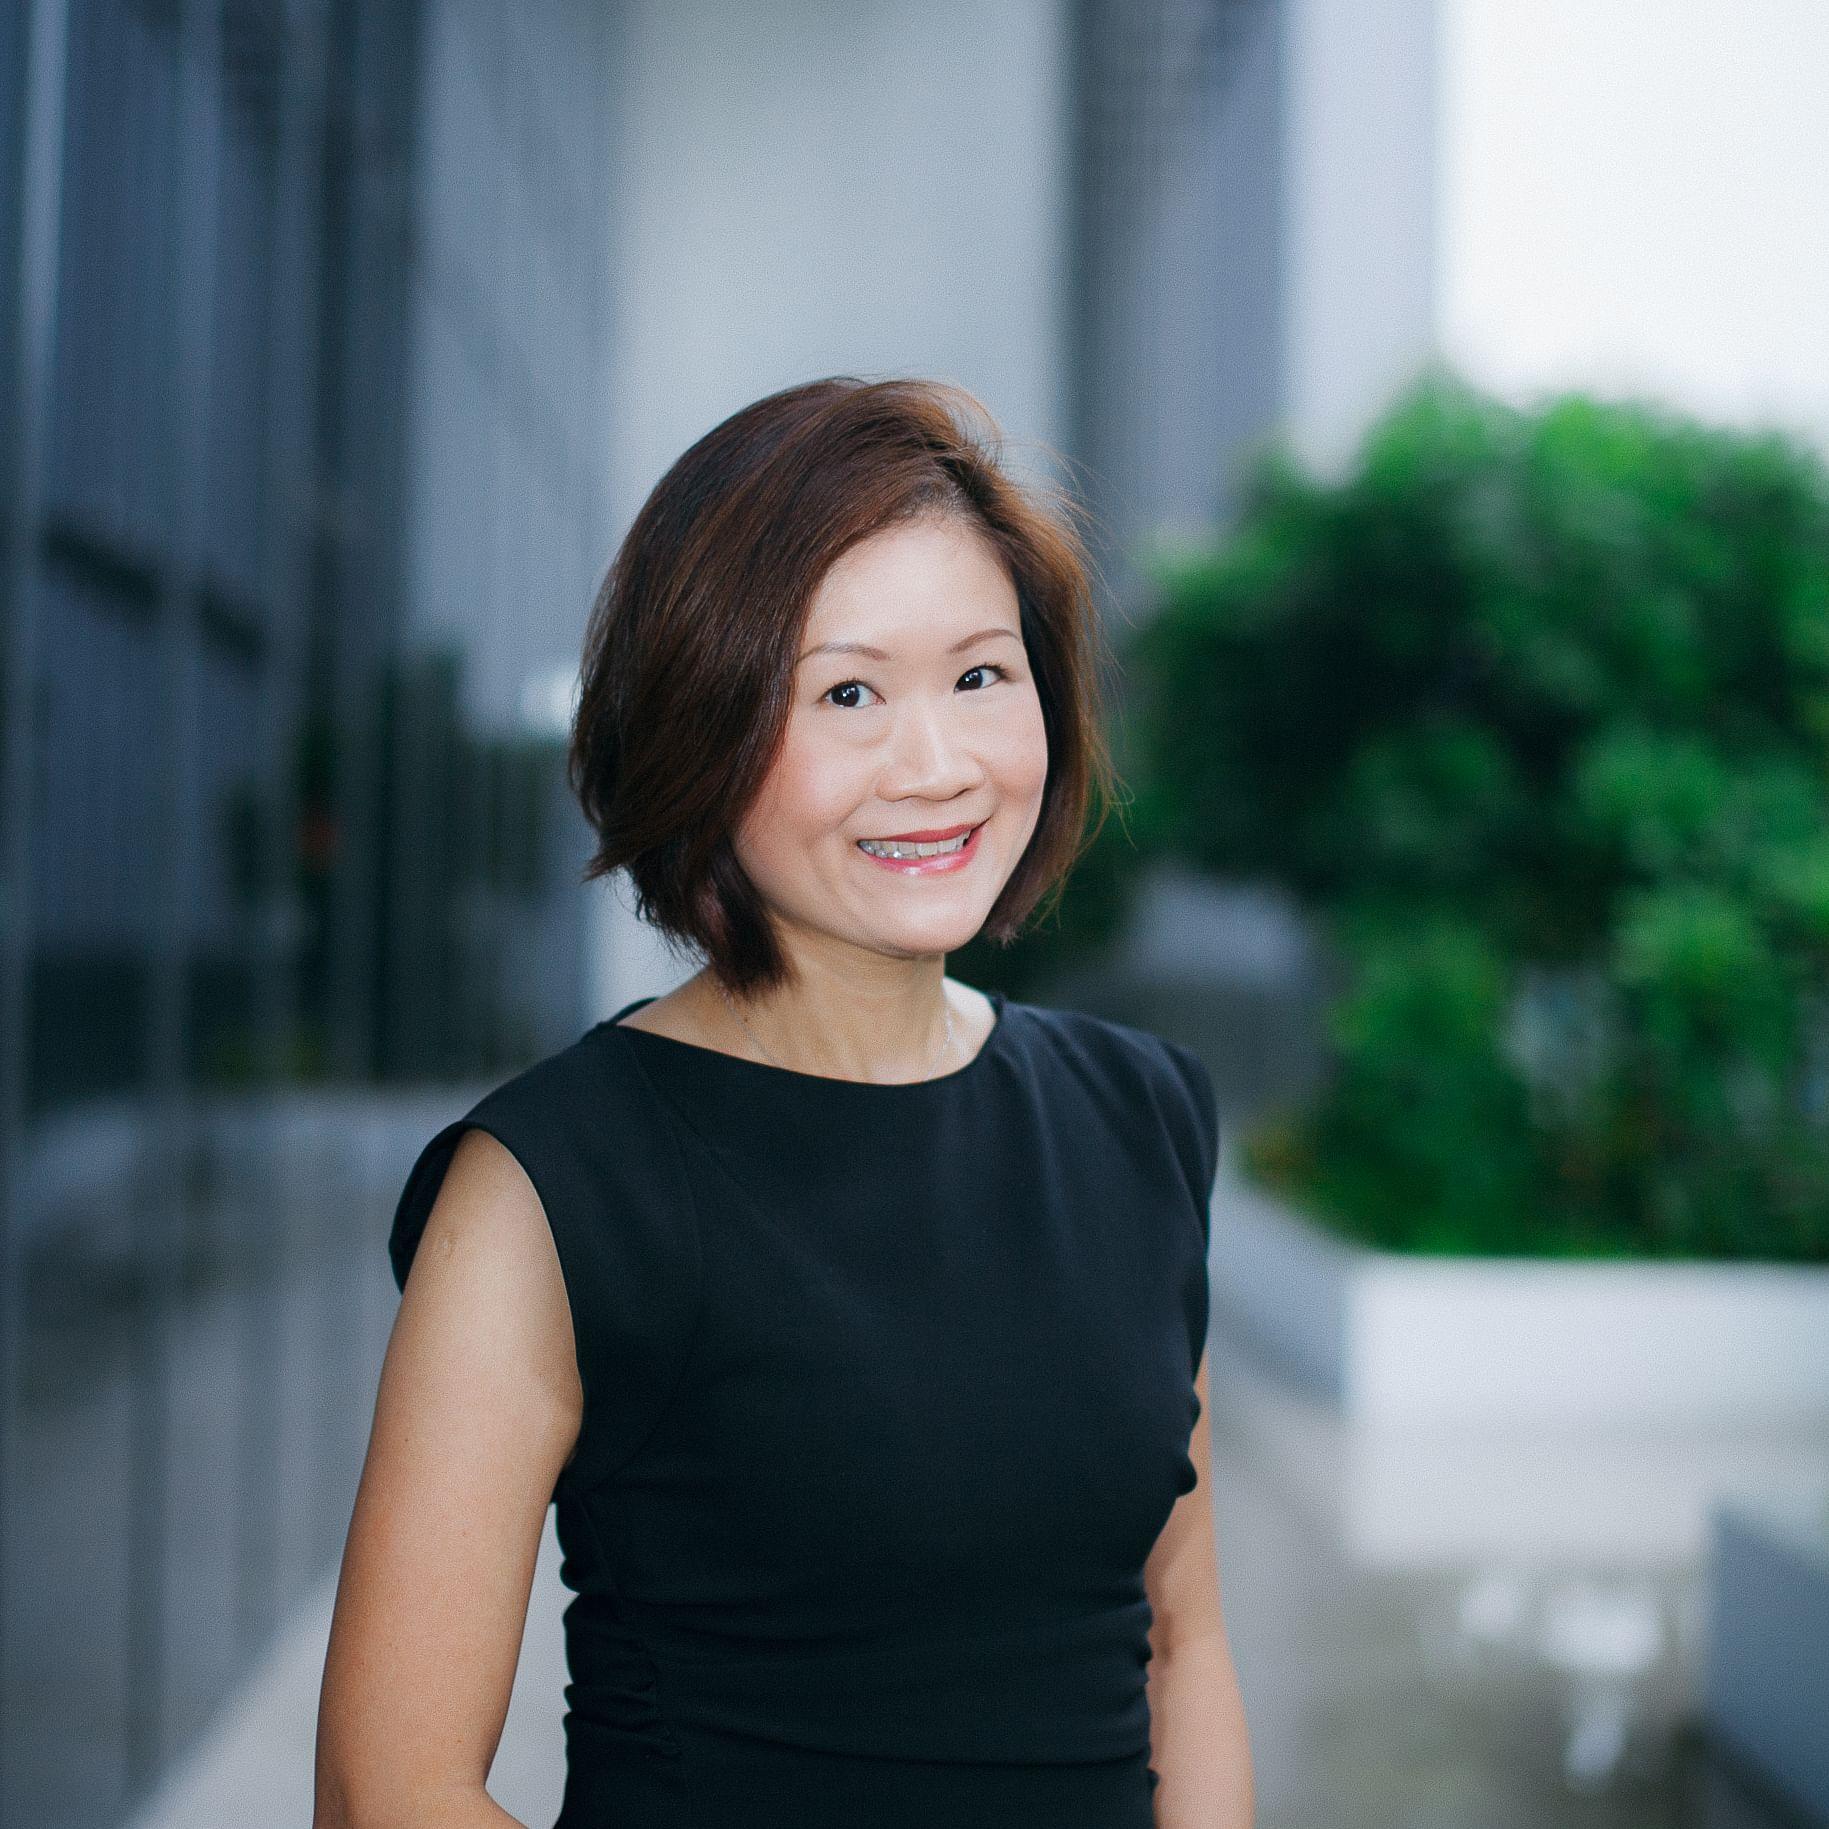 RSP Architect Law Yoke Foong